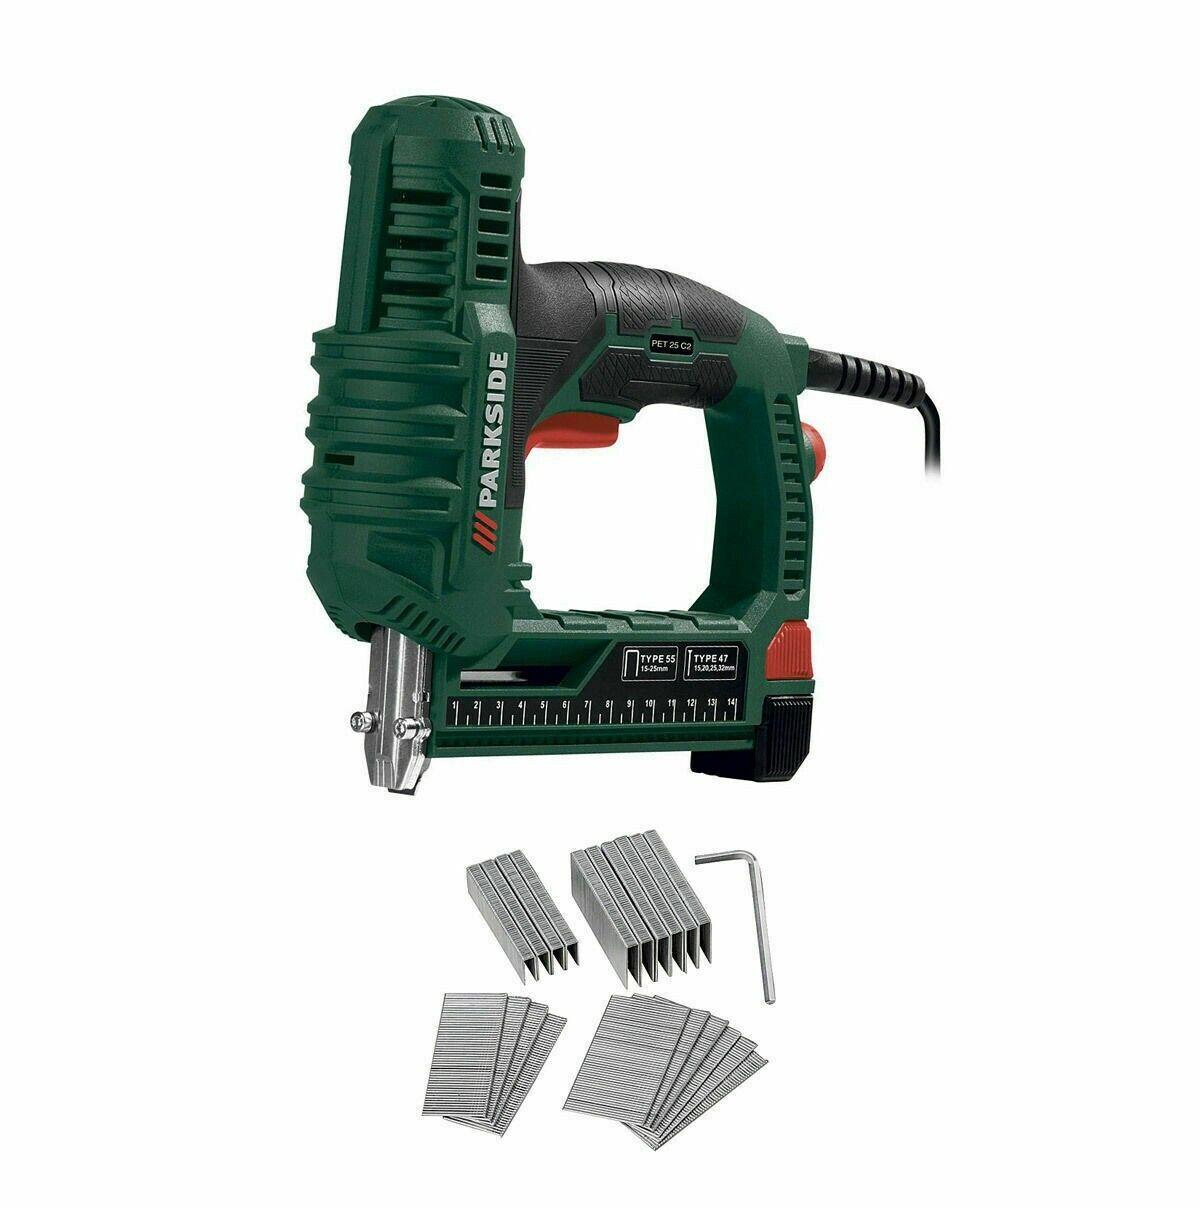 PARKSIDE® Elektrotacker PET 25 C3 Werkzeug Tacker Elektr. Hefter Klammer Gerät